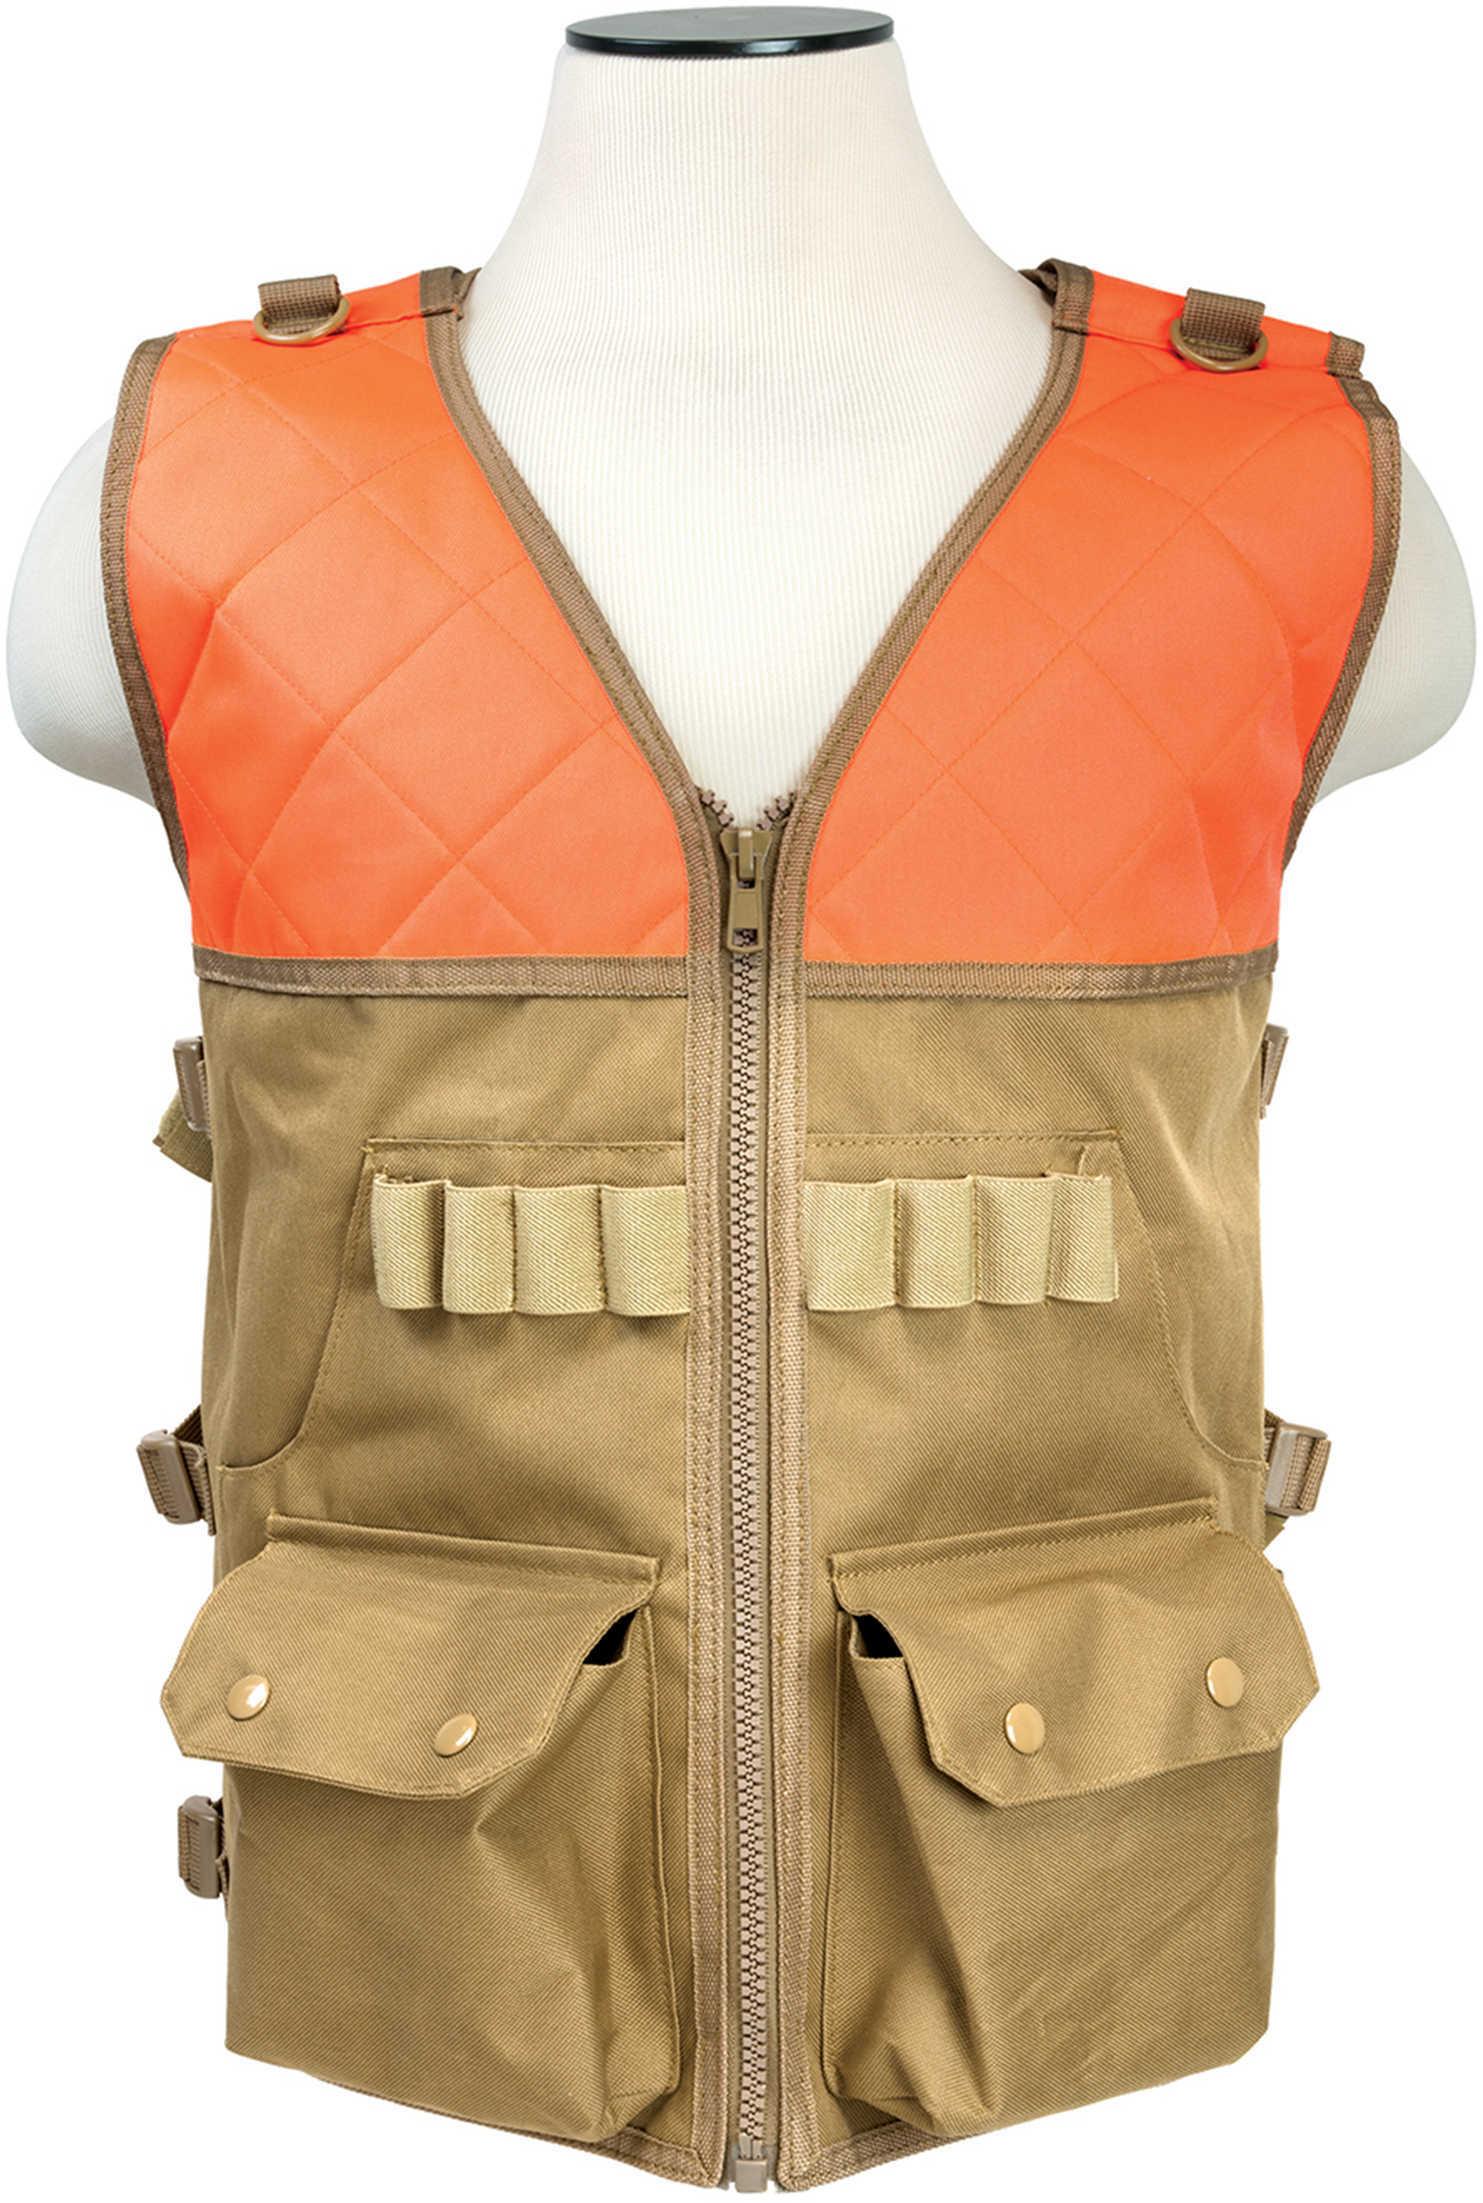 NcStar Hunting Vest/Blaze Orange And Tan CHV2942TO